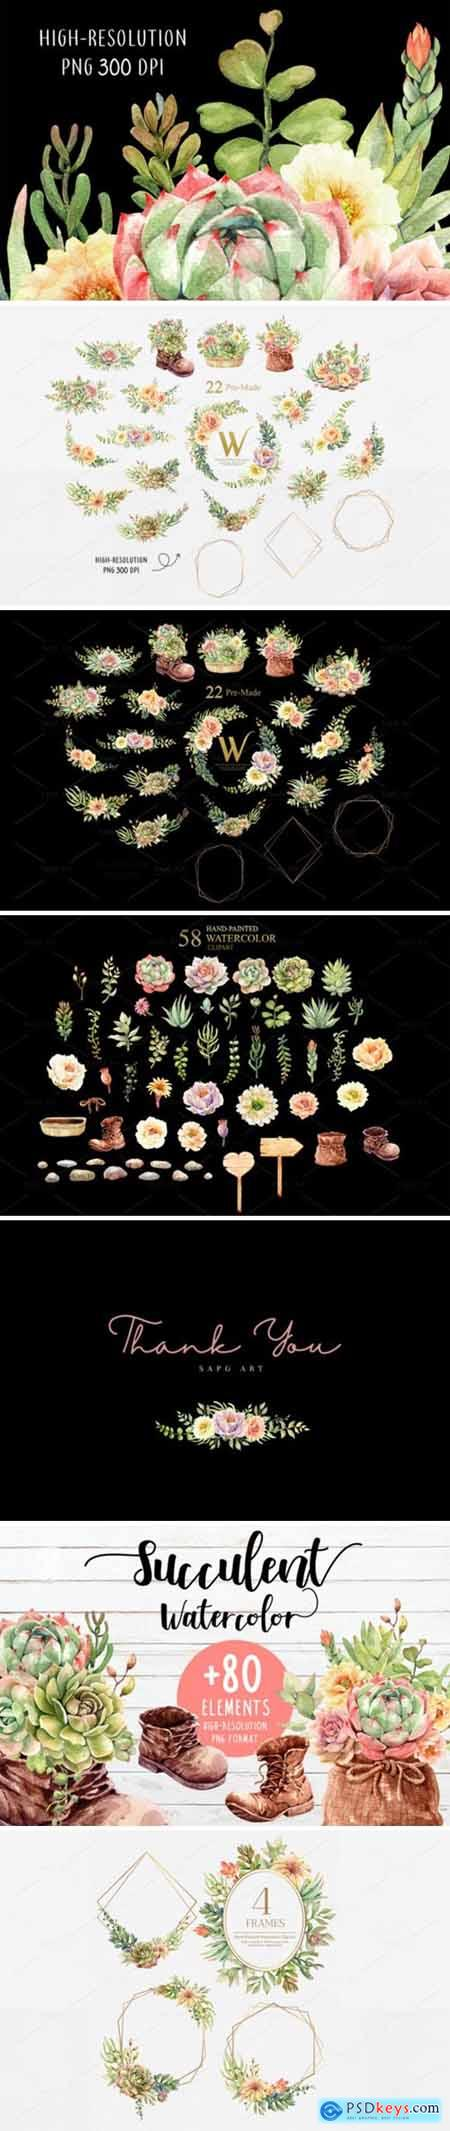 Watercolor Succulents and Shoe Pot 2013602